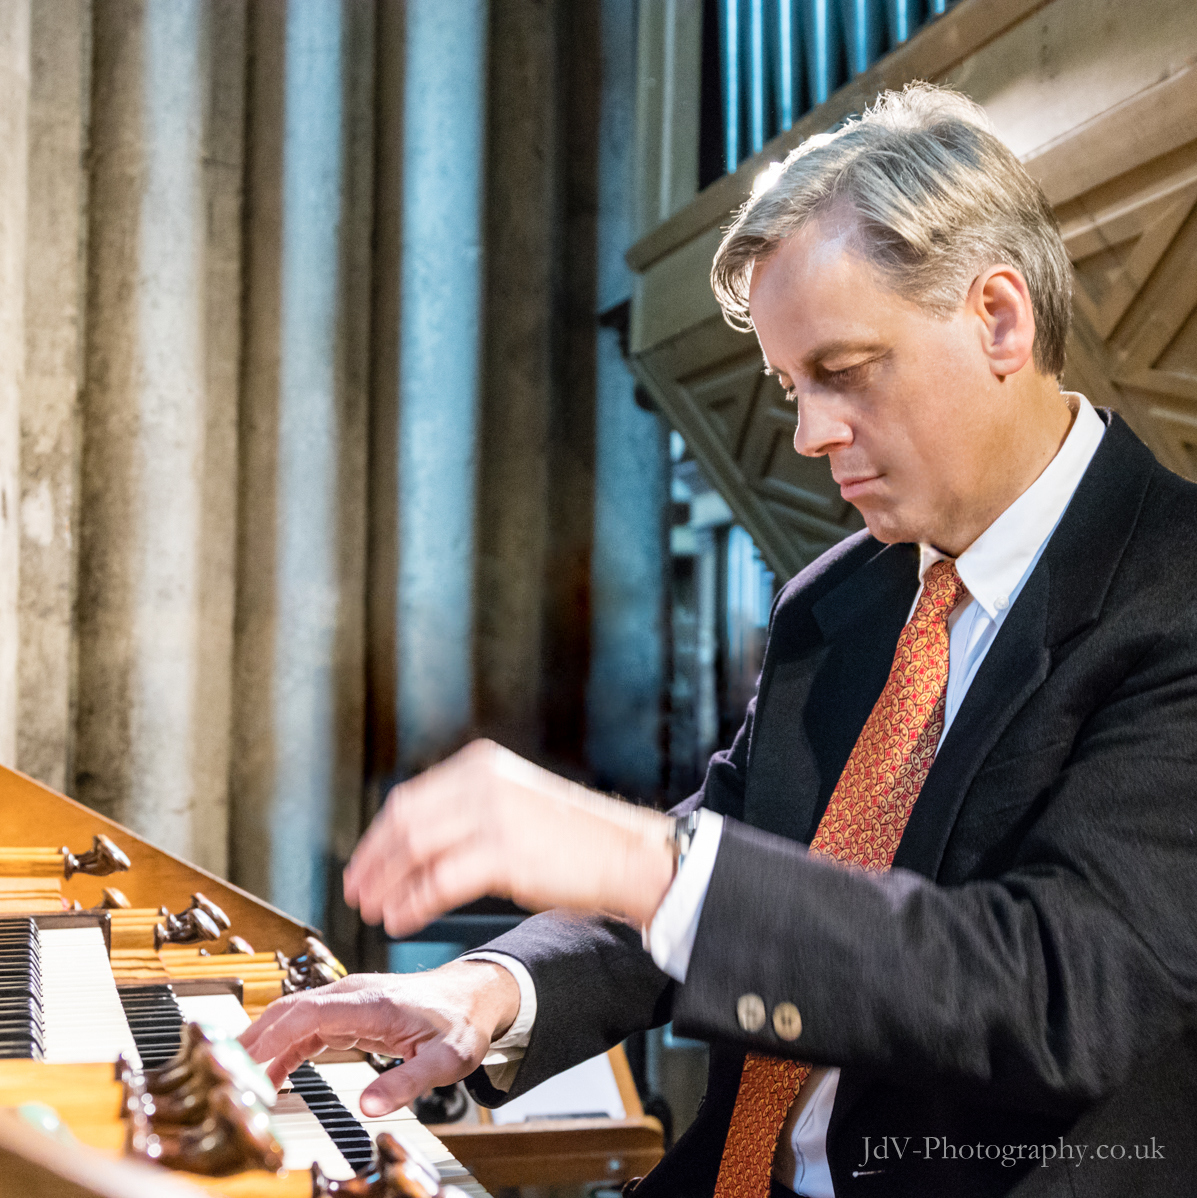 David Hirst playing the Merklin organ of Mantes-la-Jolie